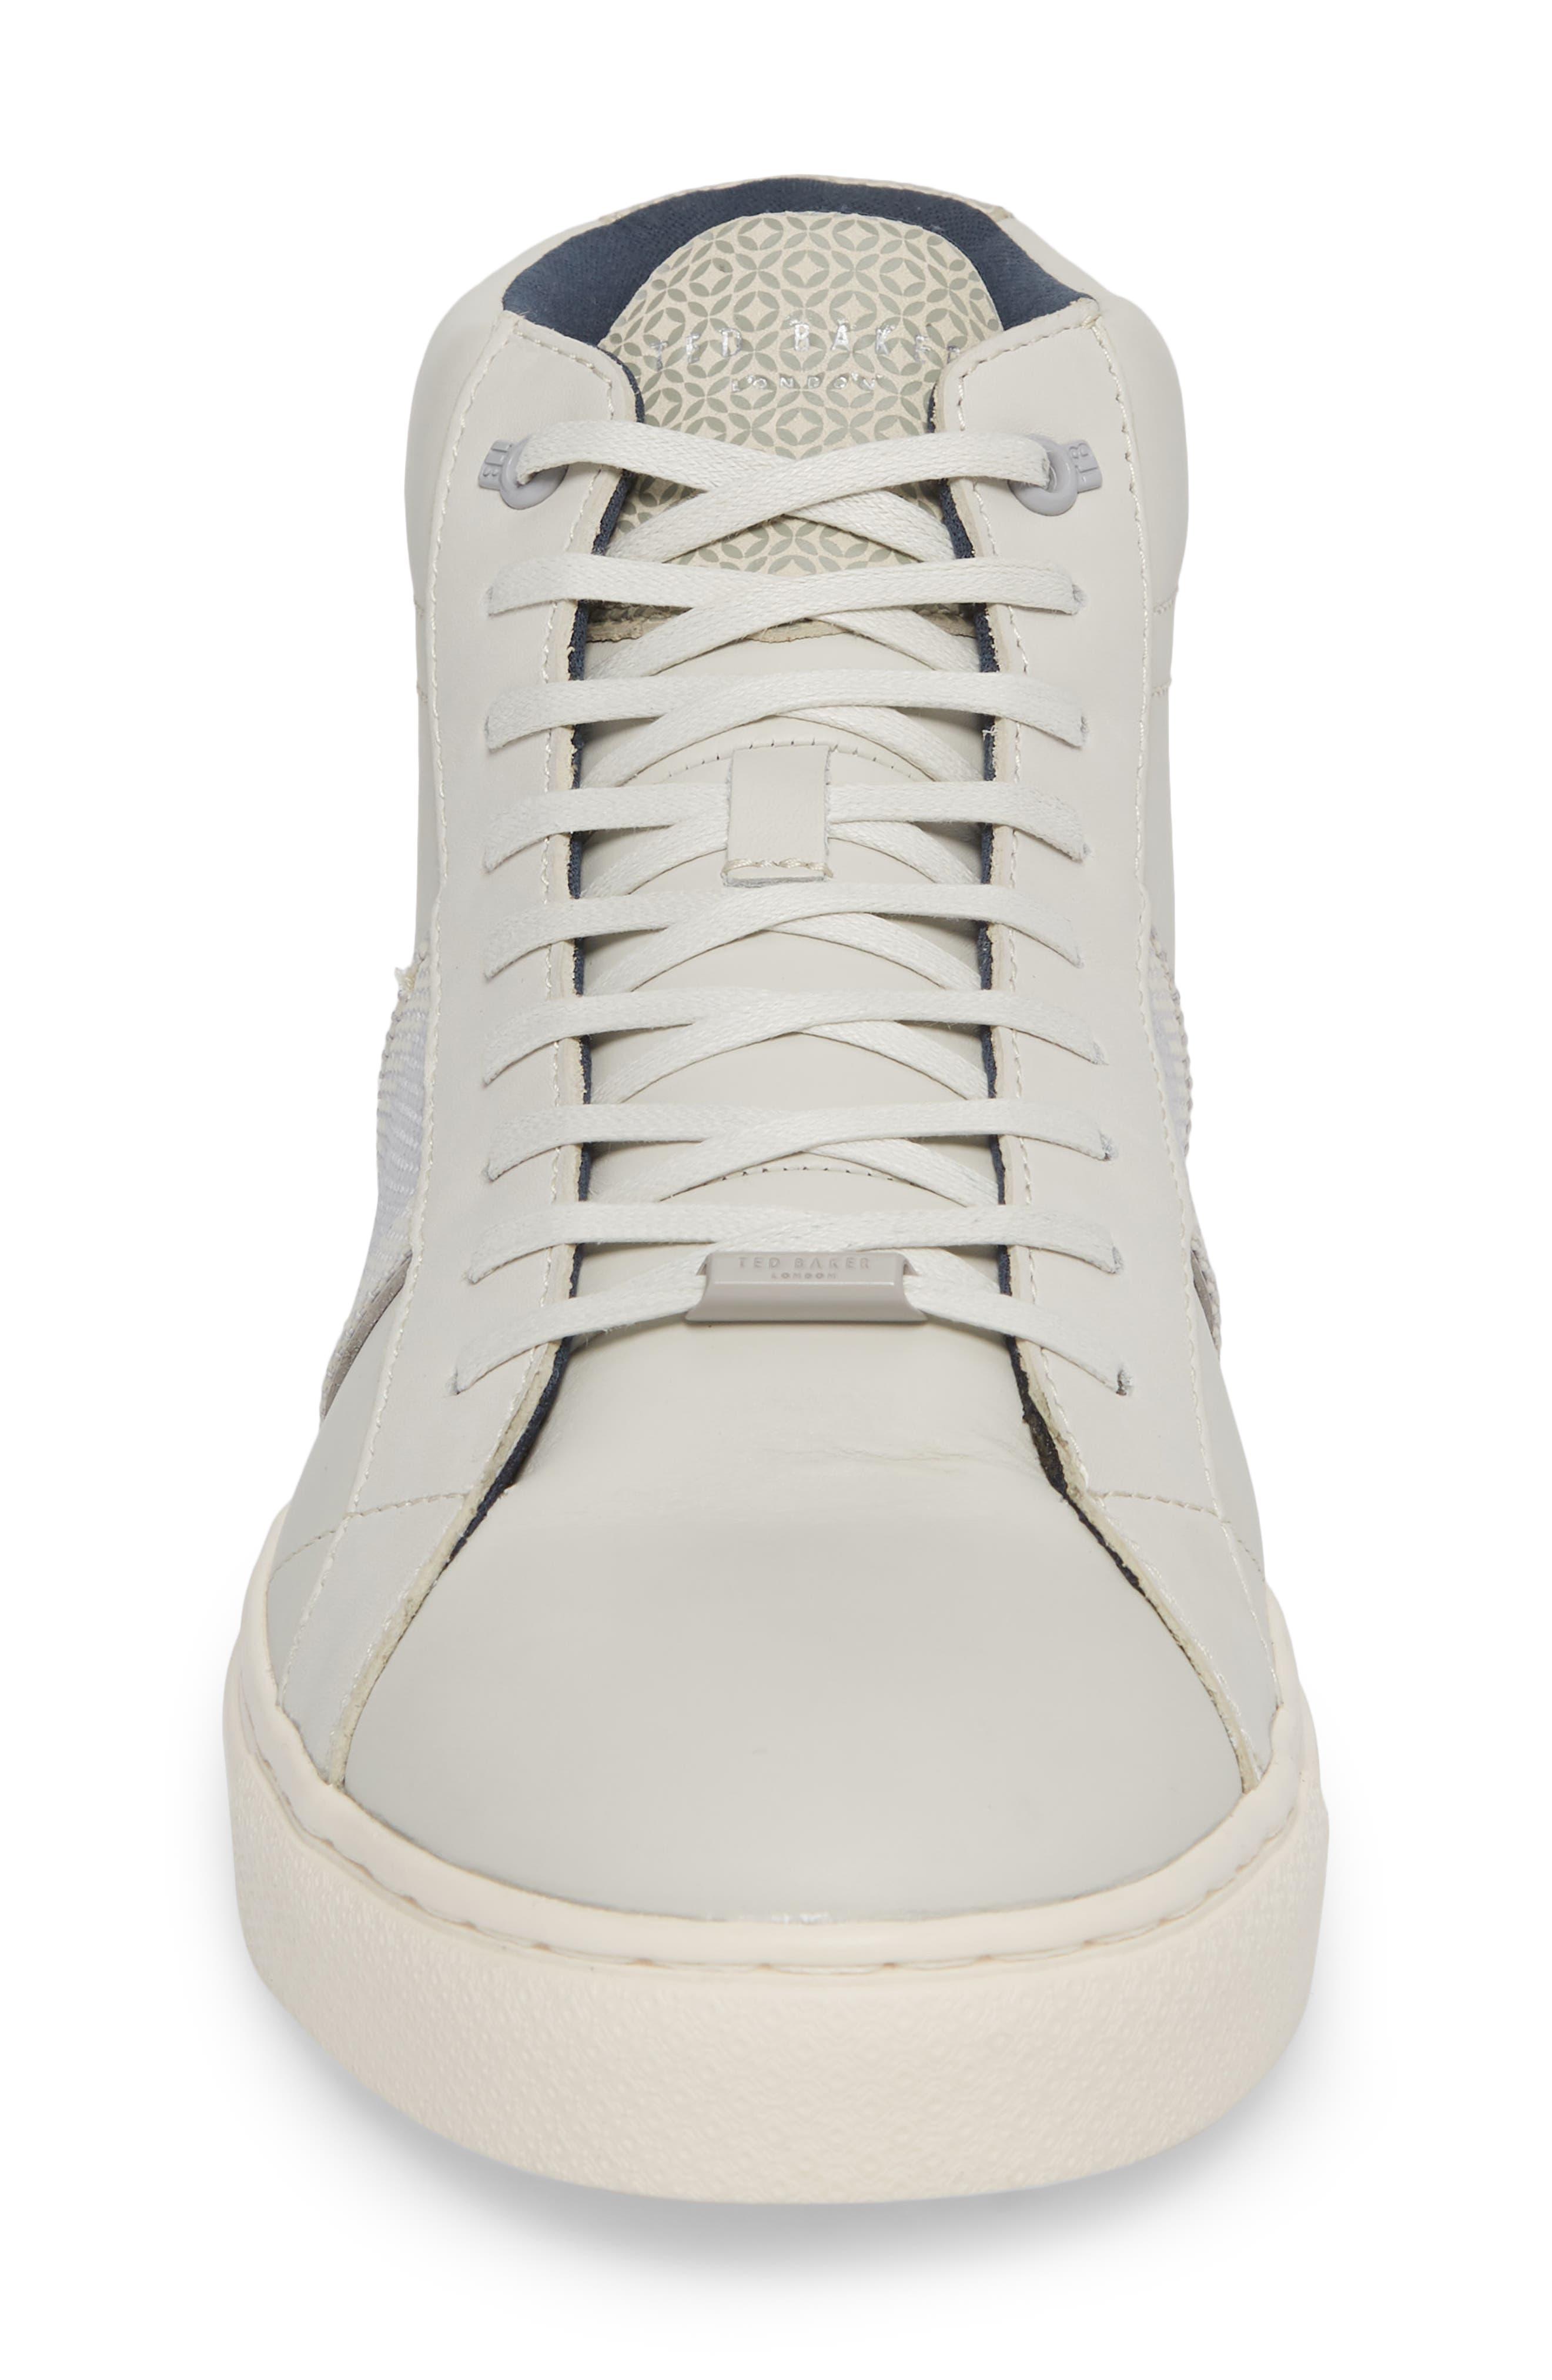 Cruuw High Top Sneaker,                             Alternate thumbnail 4, color,                             152